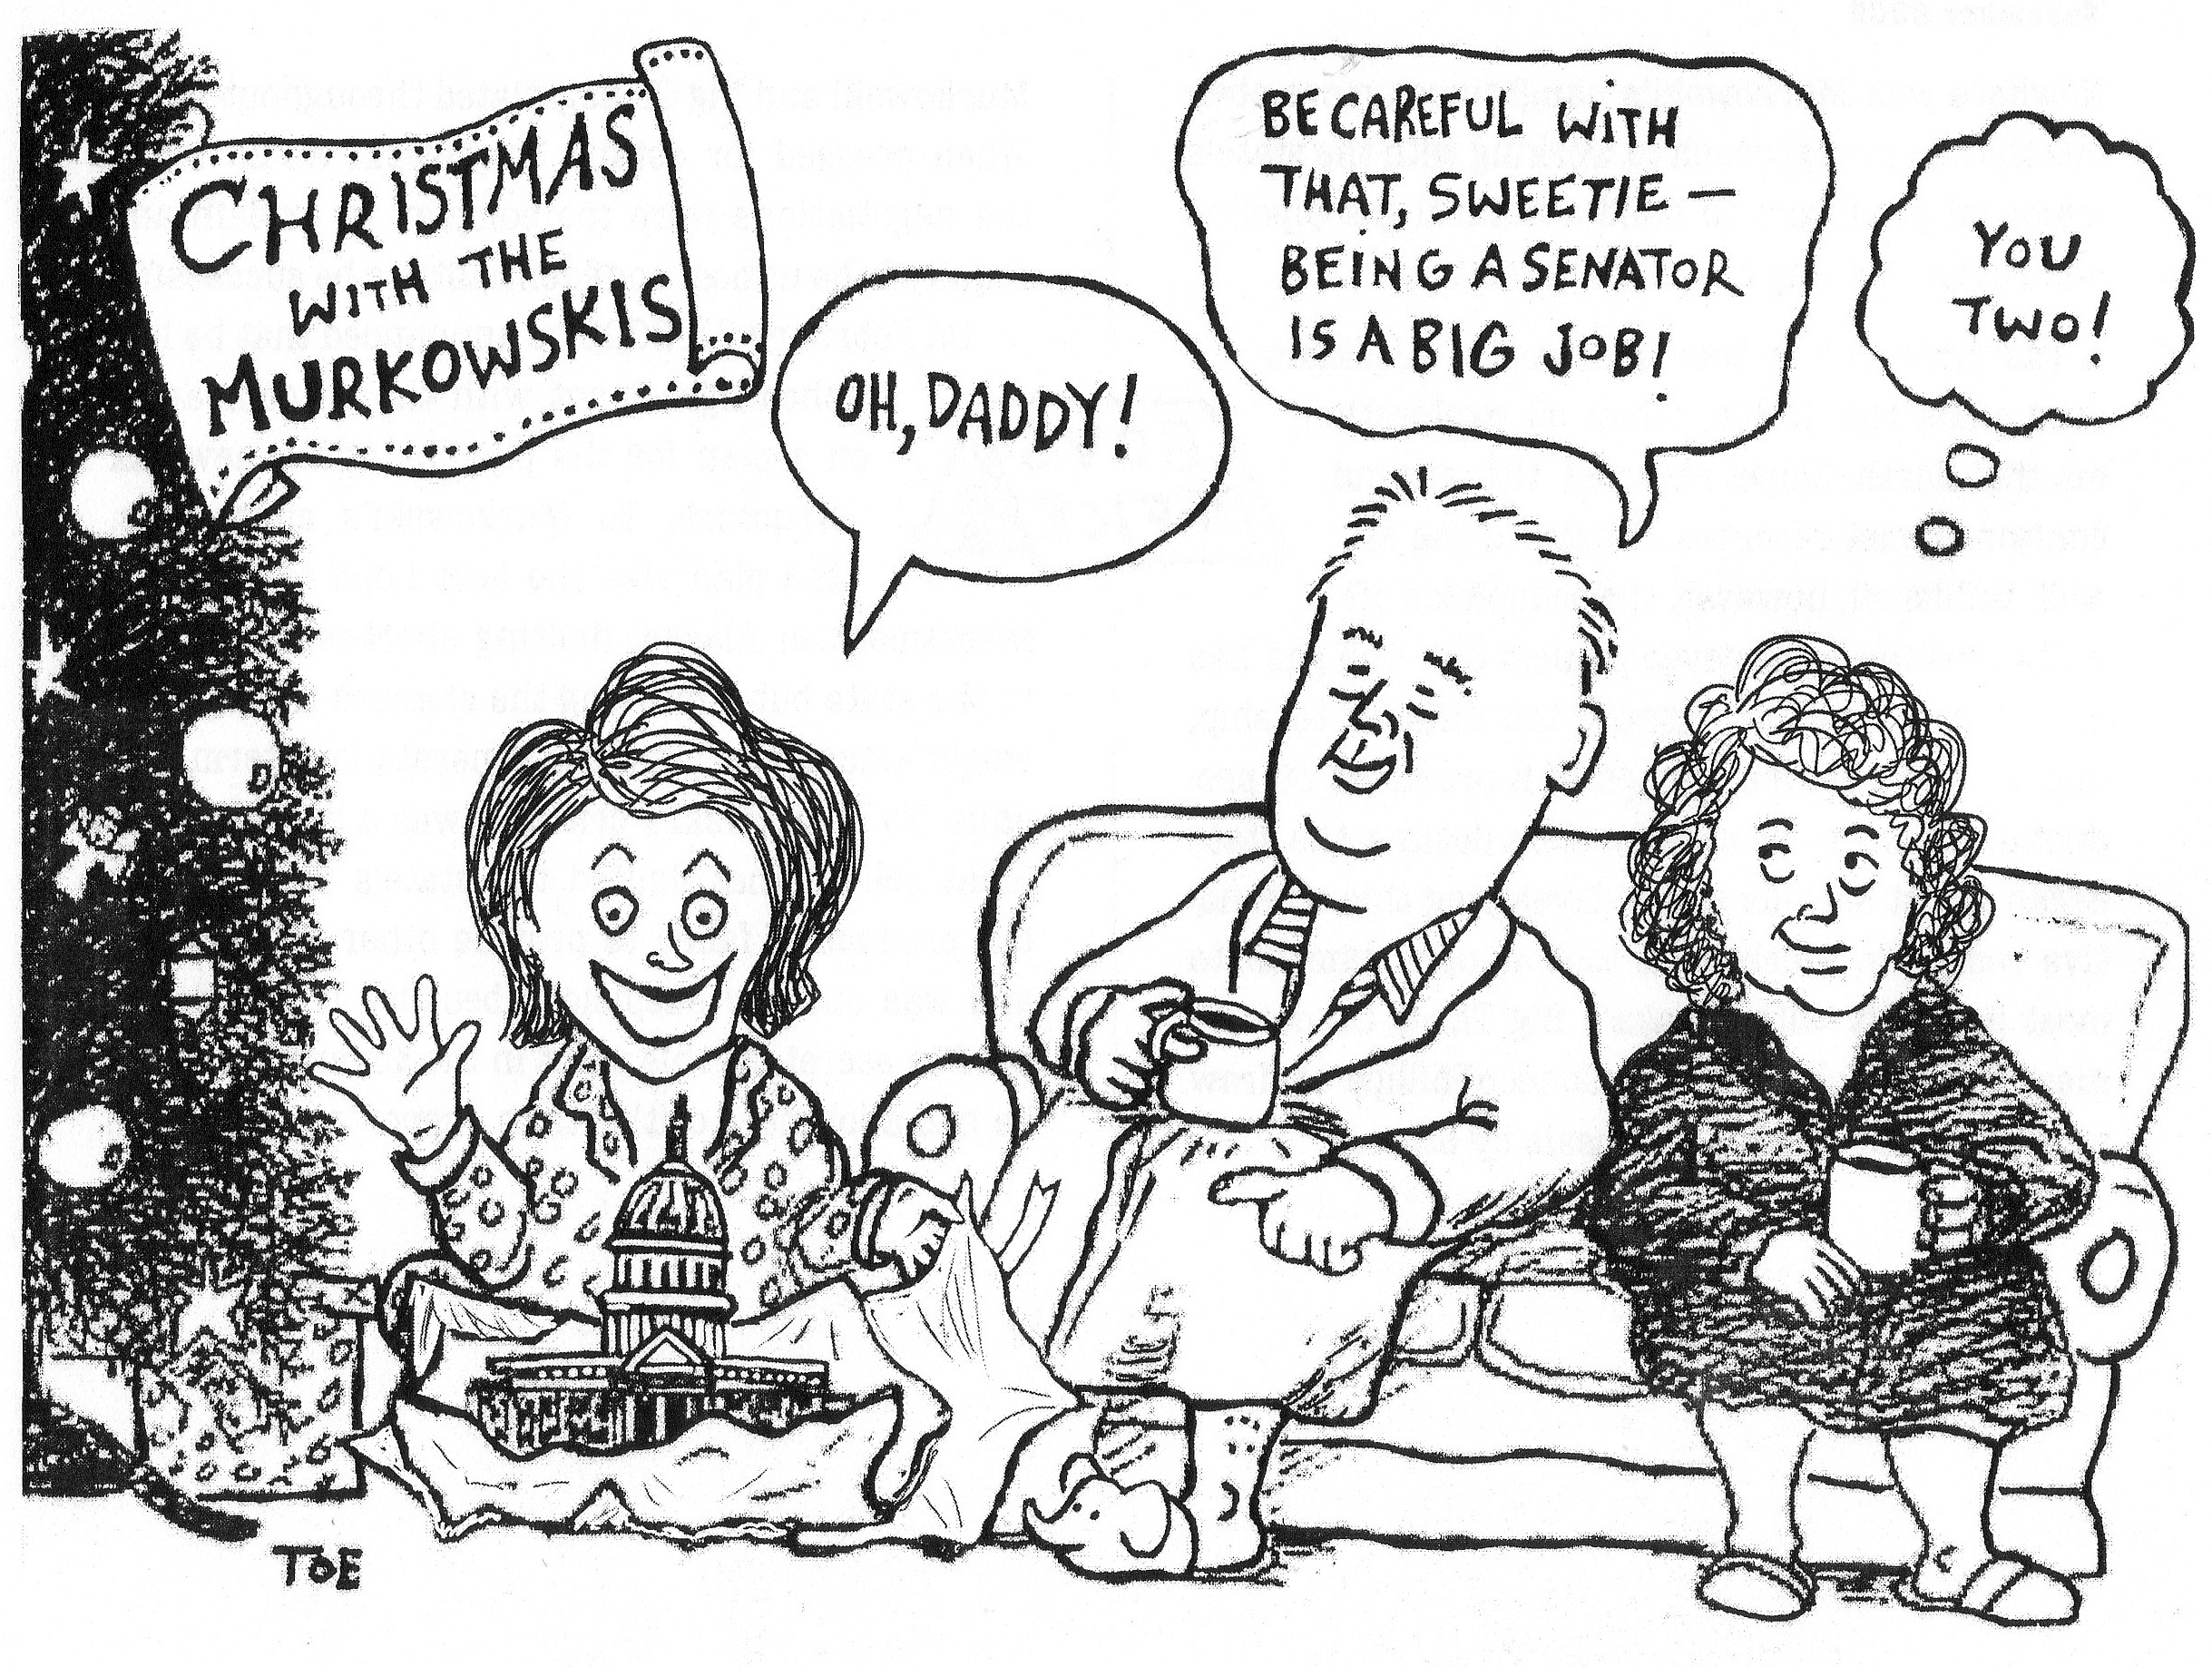 Political Cartoonist S Book Highlights Palin Alaska